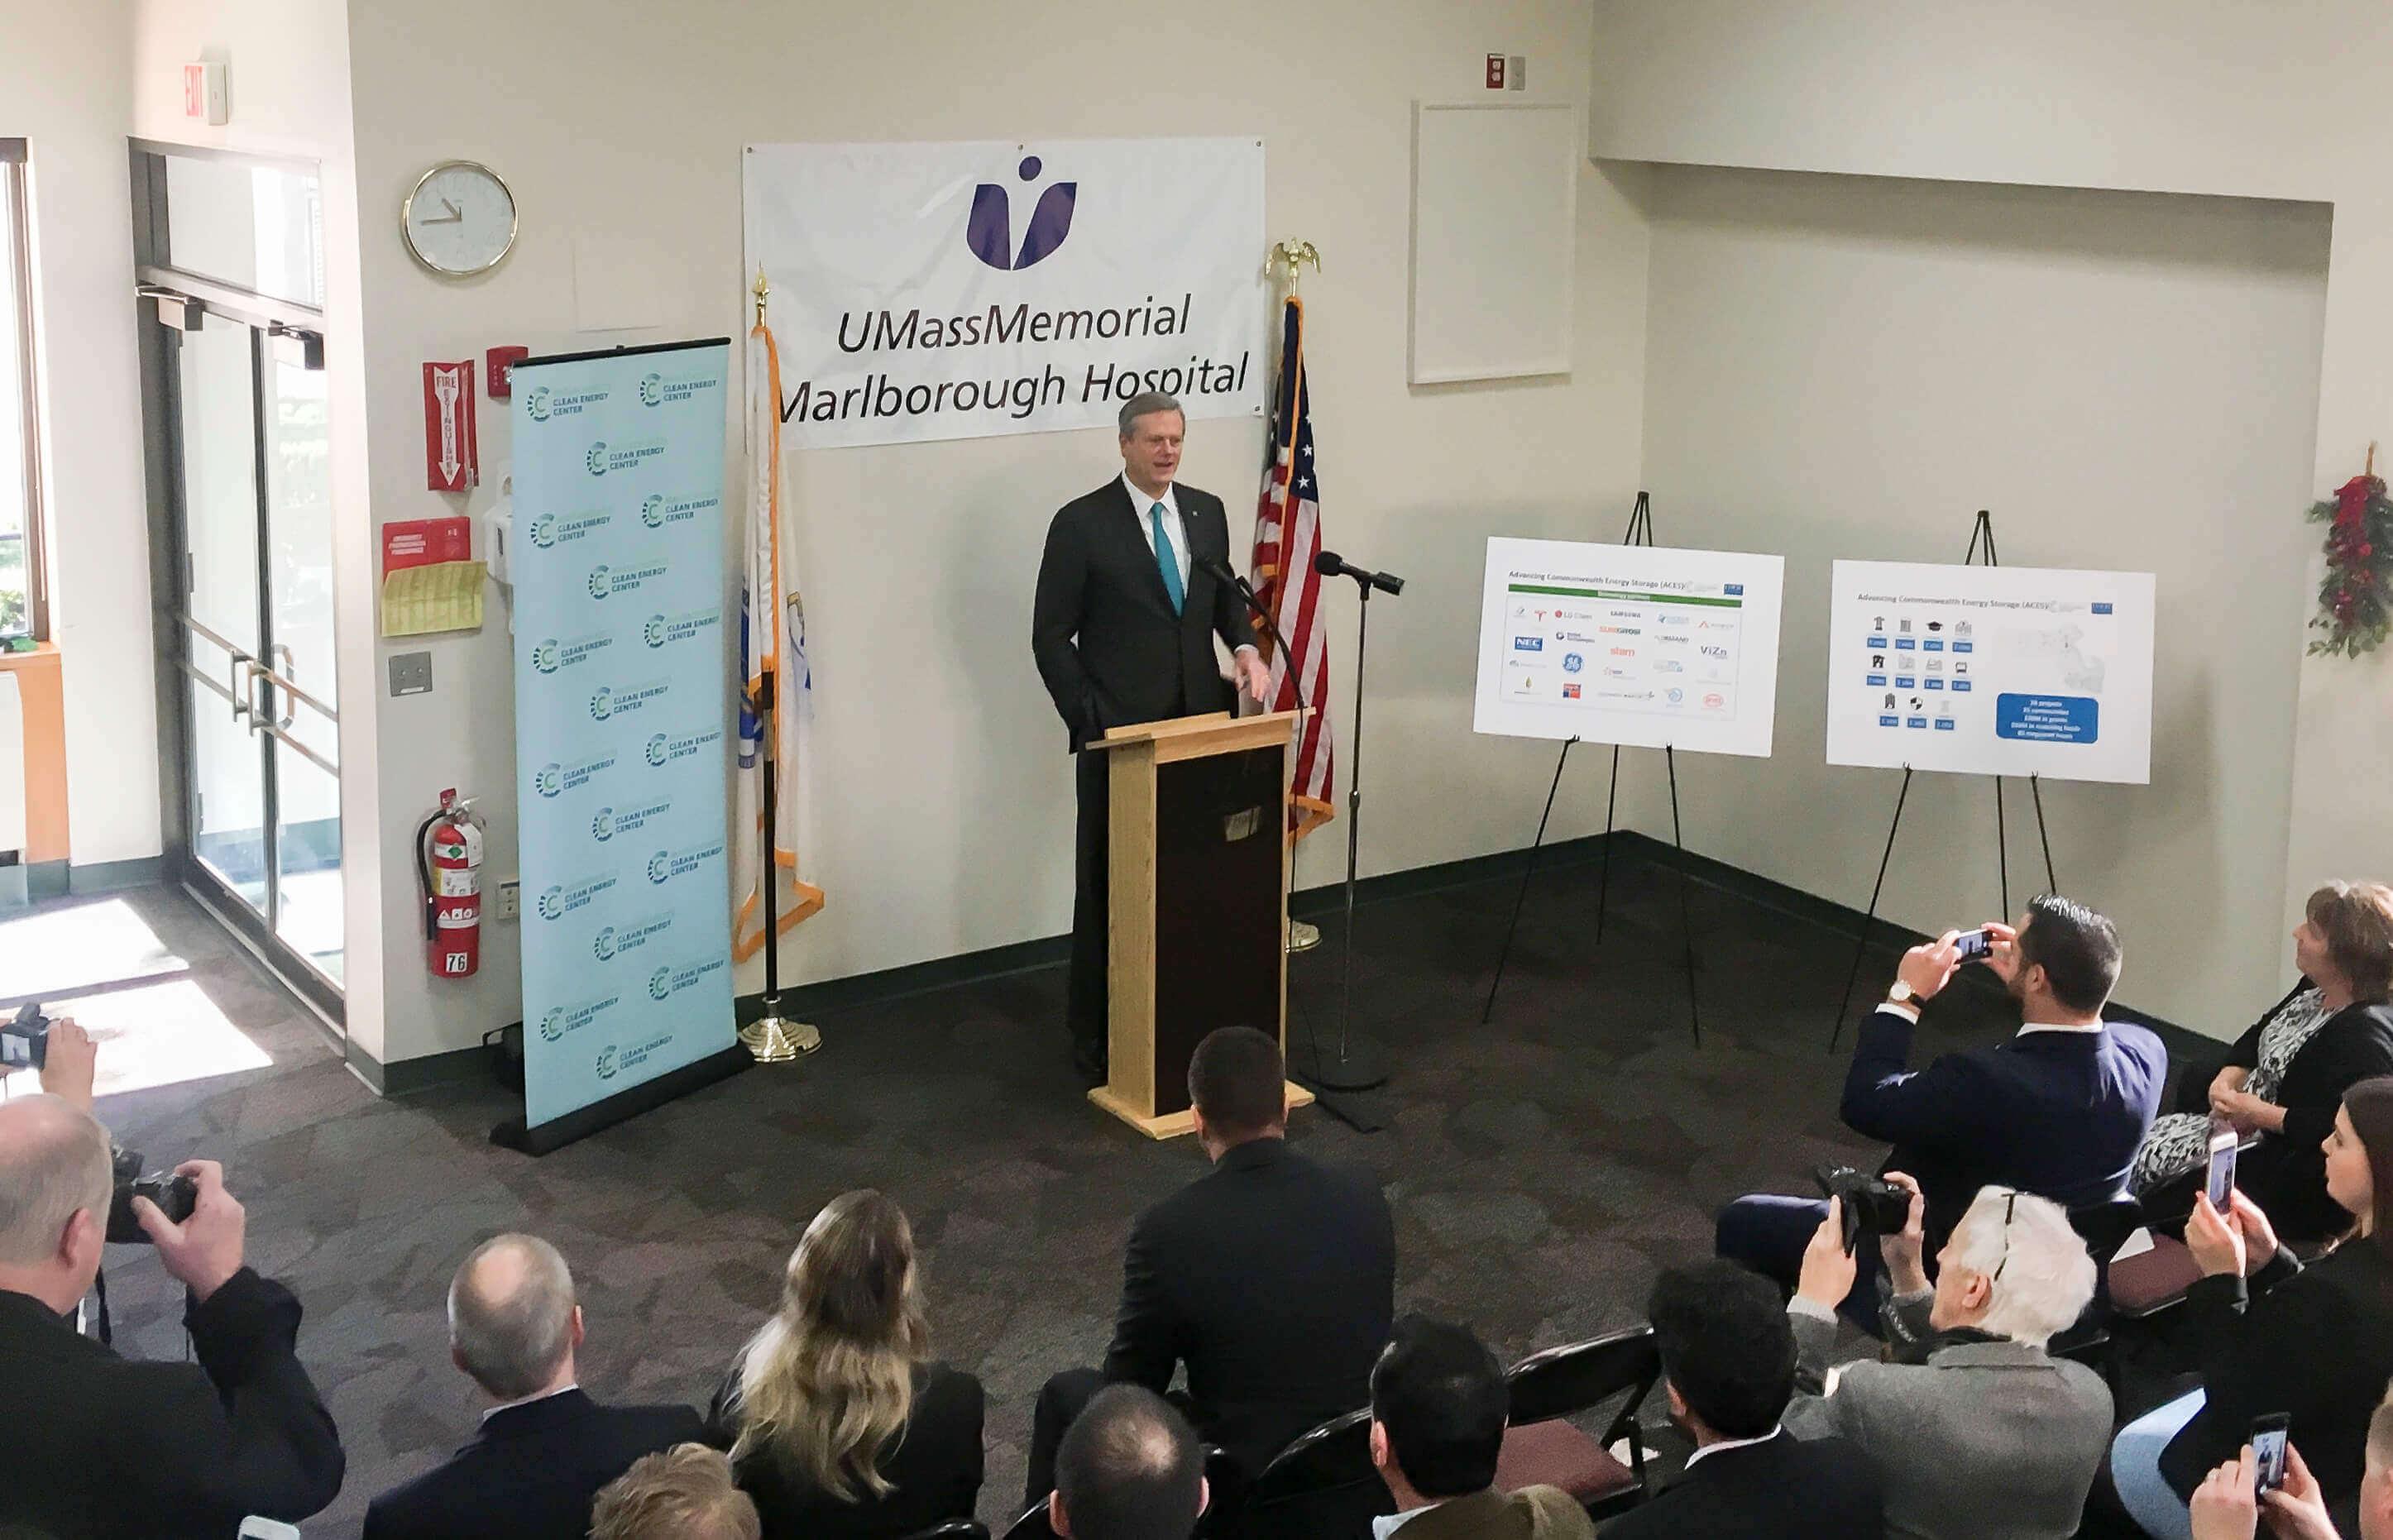 massachusetts awards 20 million for energy storage projects solar